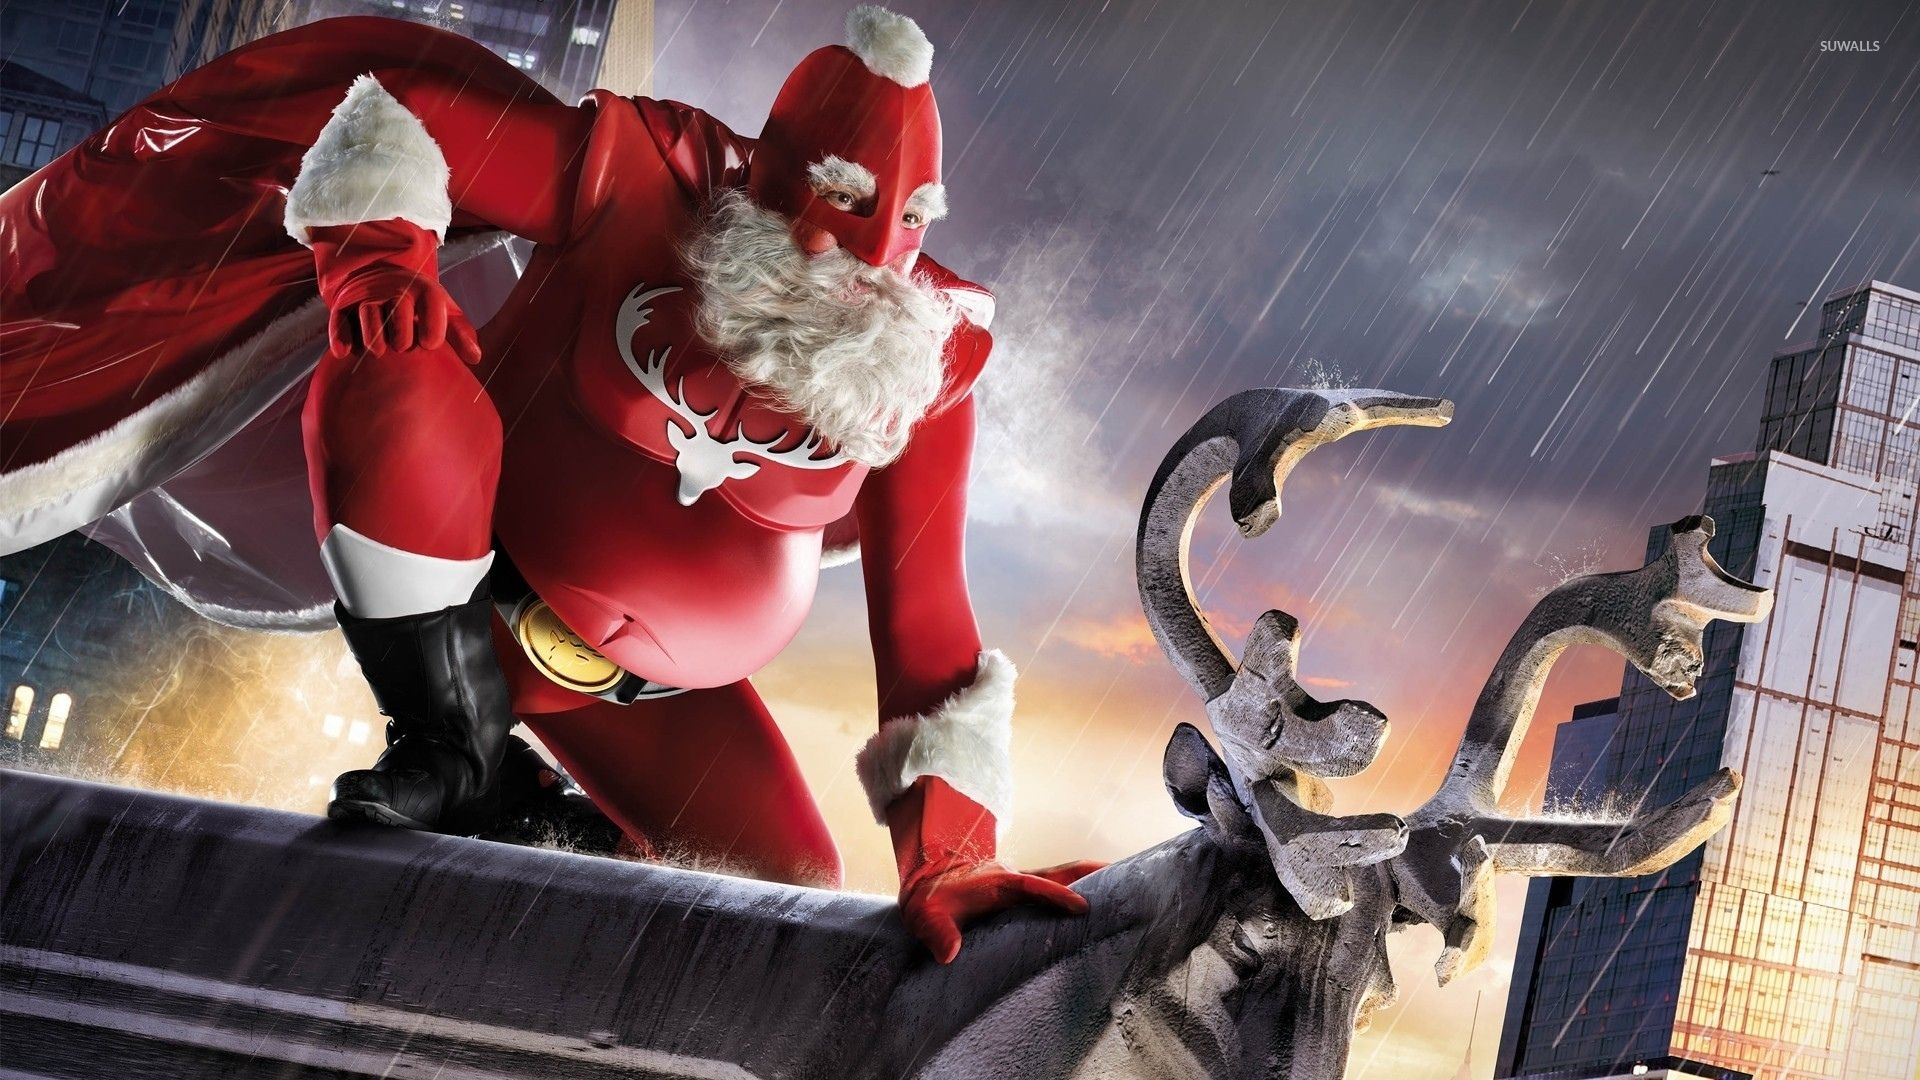 Santa Claus hd wallpaper 1080